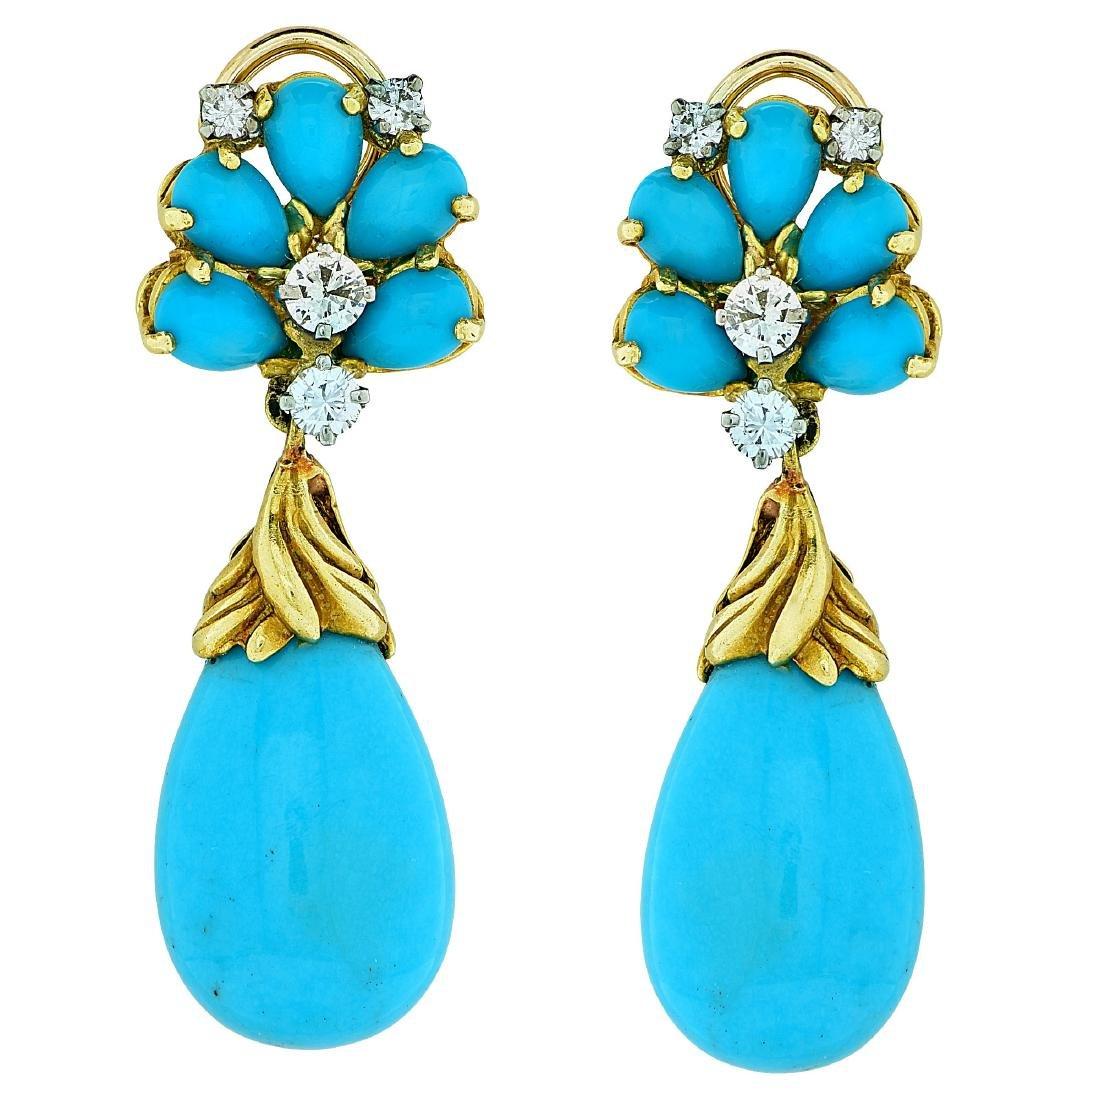 Vintage 18K Gold Turquoise Diamond Earrings